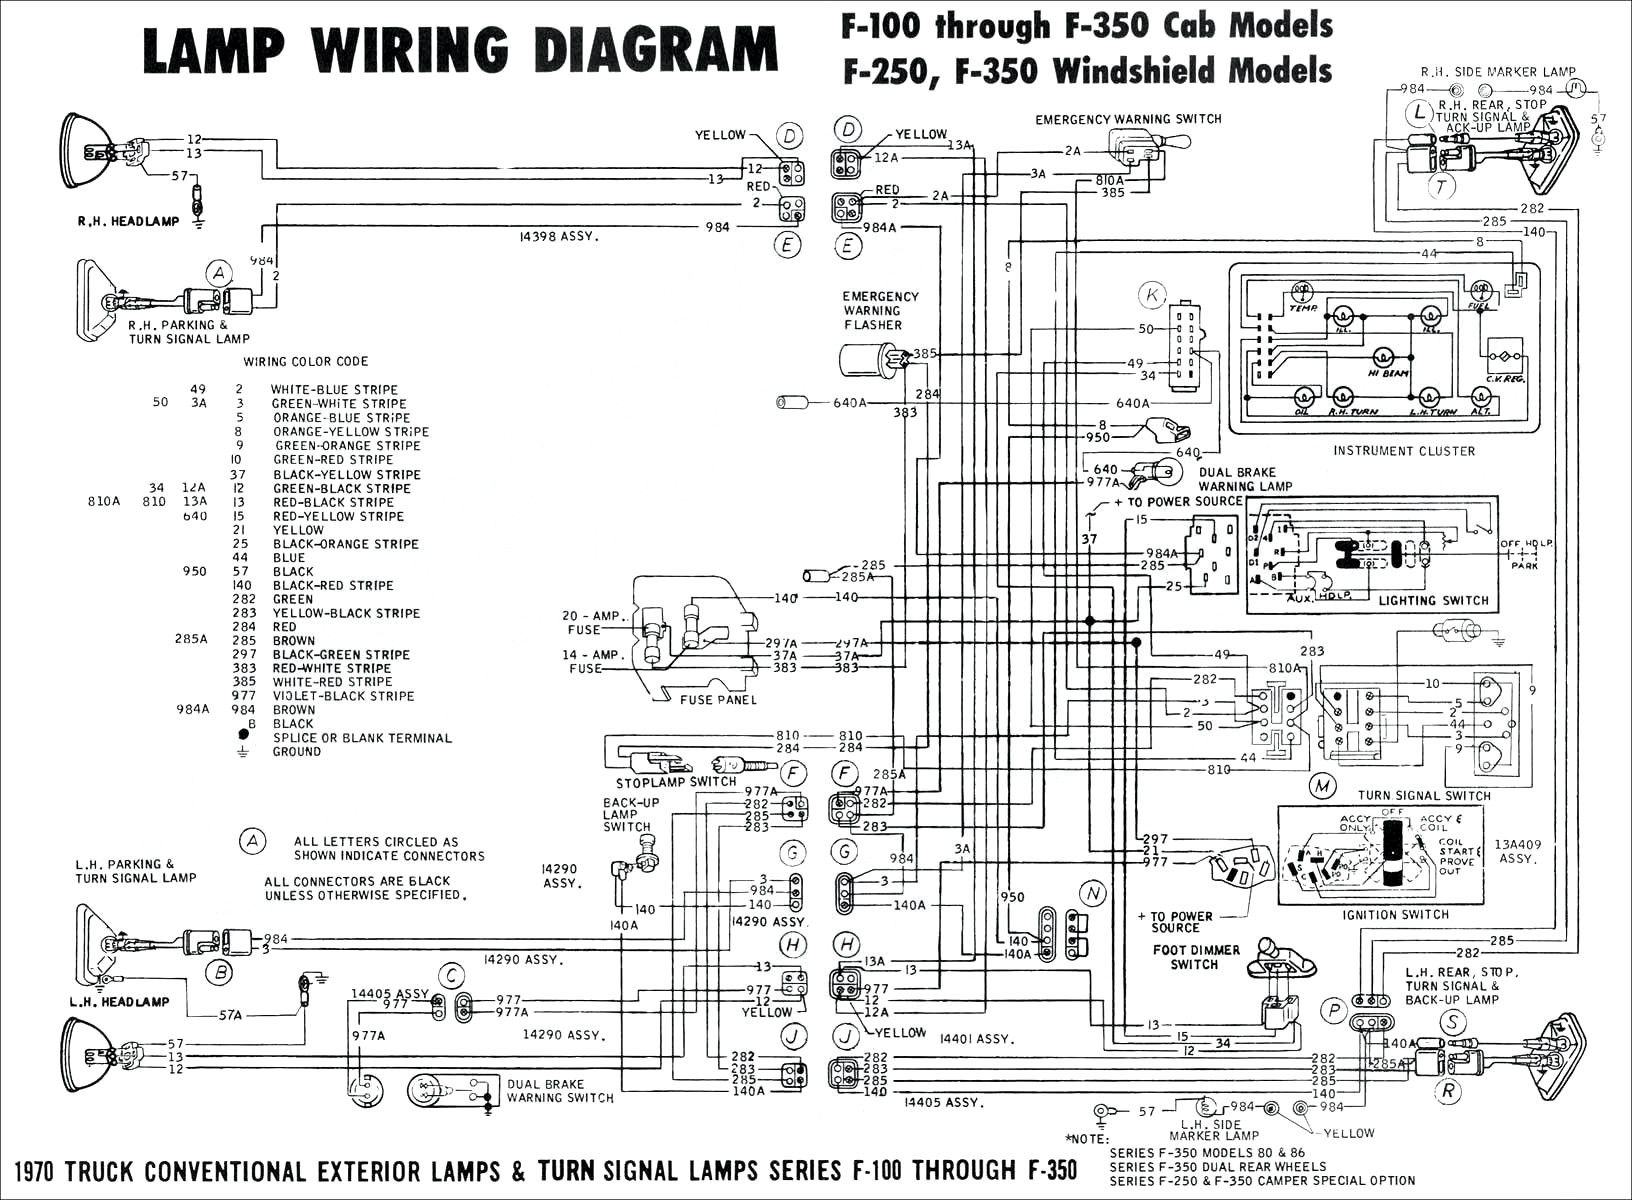 tork time clock wiring diagram Download-Asco Series 300 Wiring Diagram Fresh Tork Time Clock Wiring Diagram 11-j